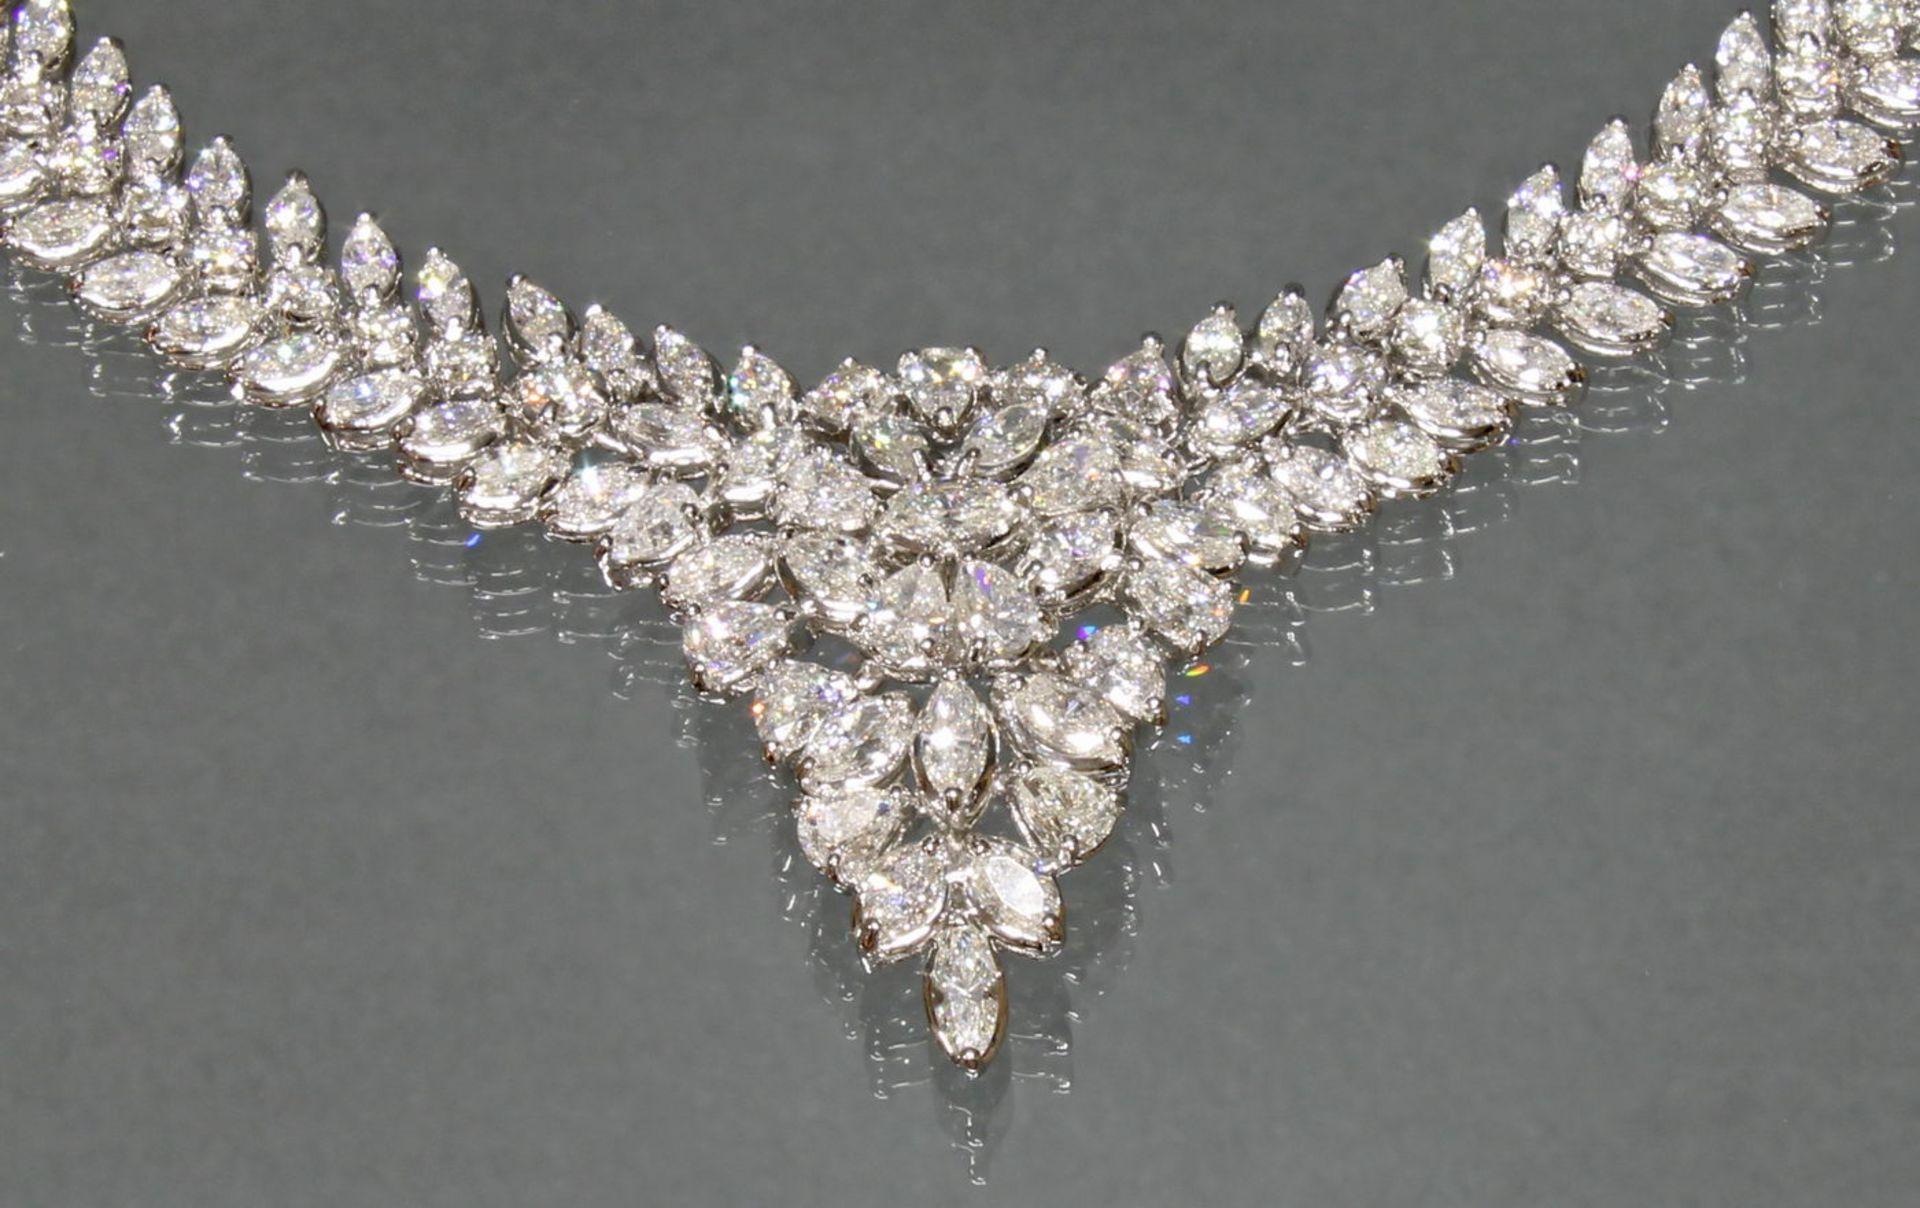 Collier, Atelier J.P. CAM, Fine Jewelery, Hongkong, WG 750, ca. 19.05 ct. - Bild 4 aus 4